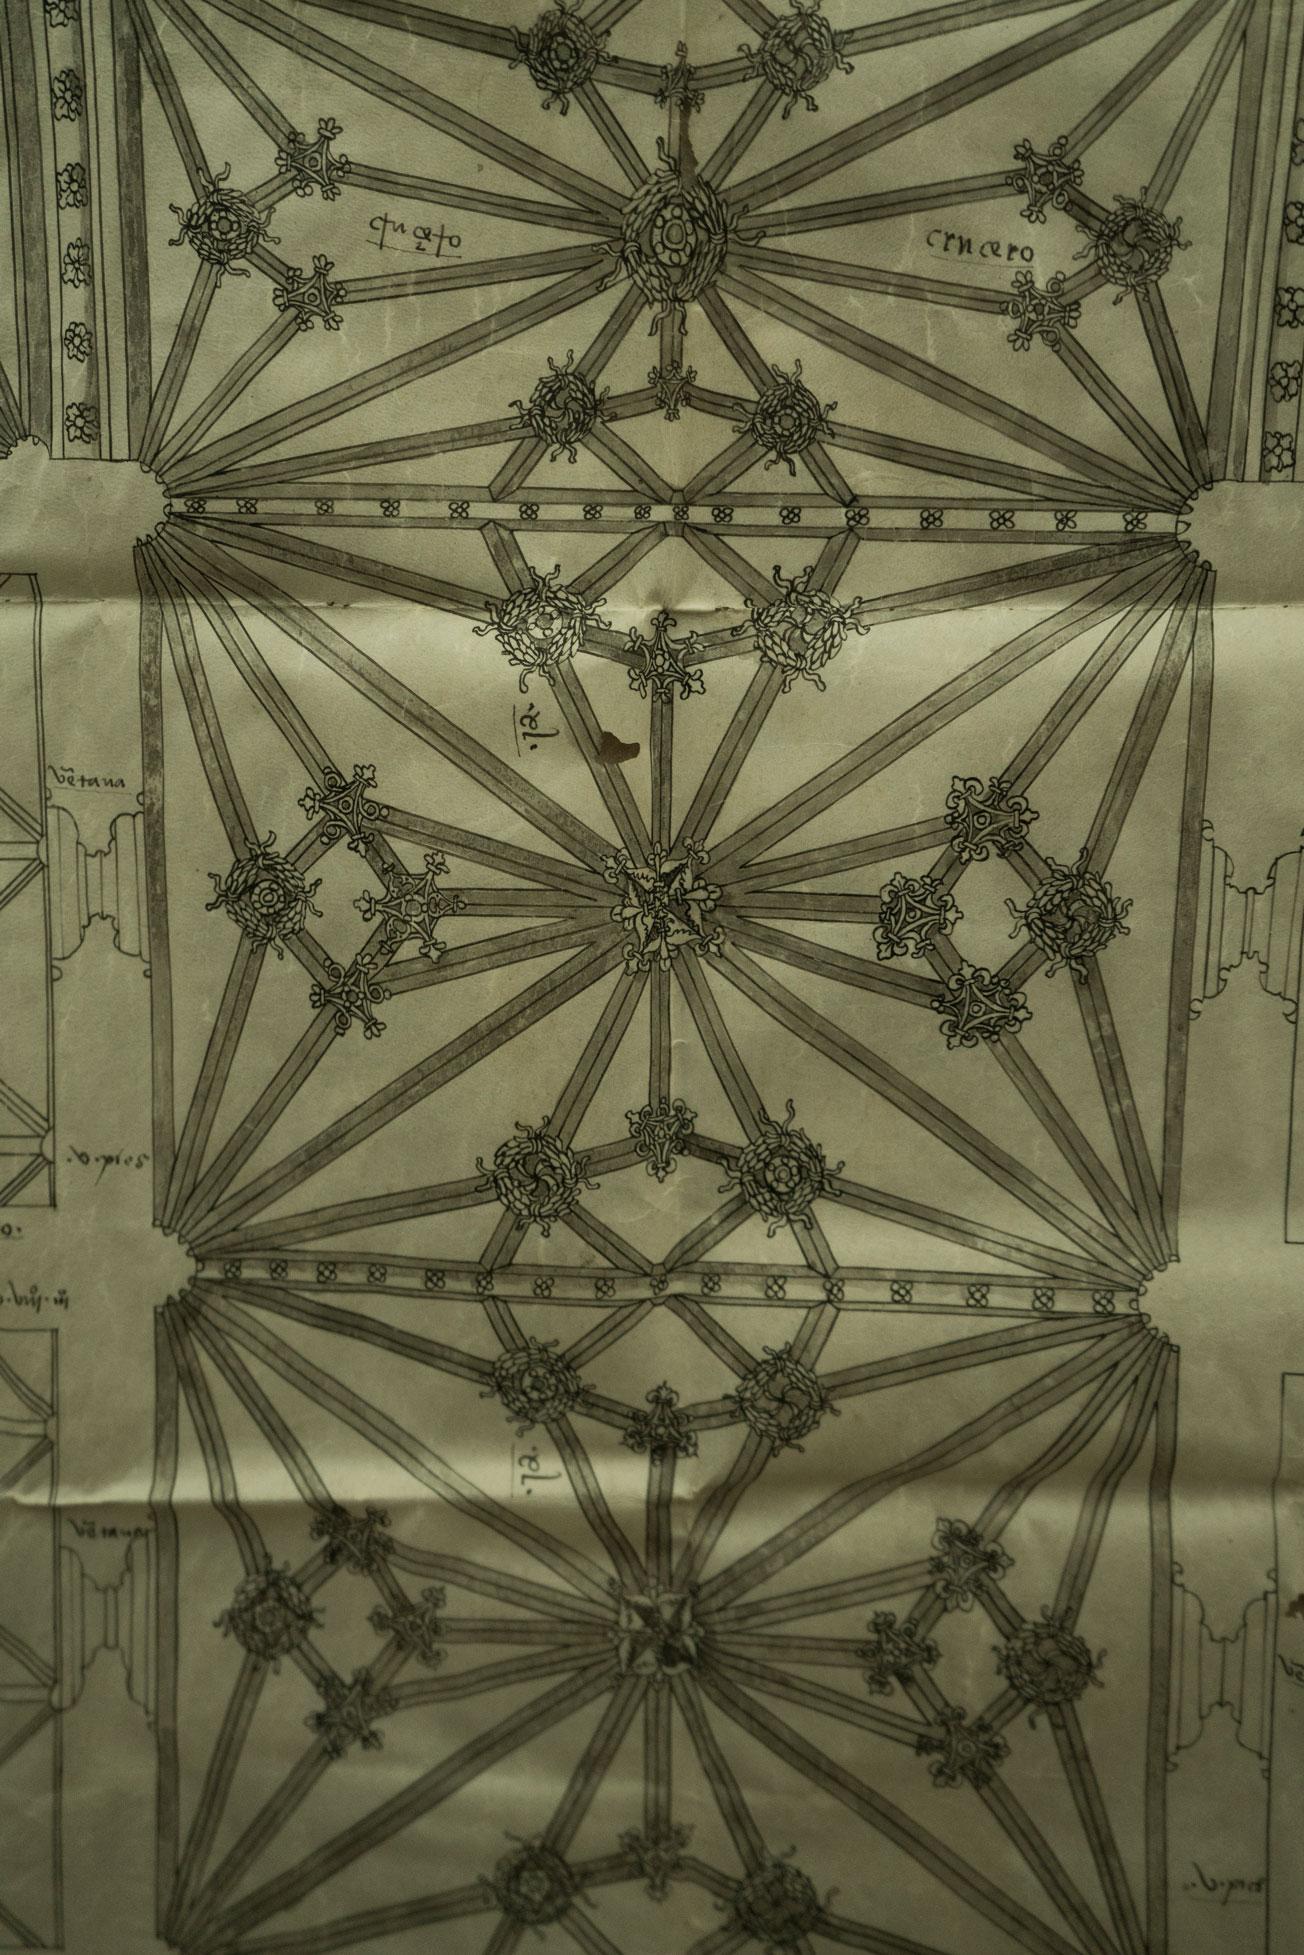 Cathedral original plans